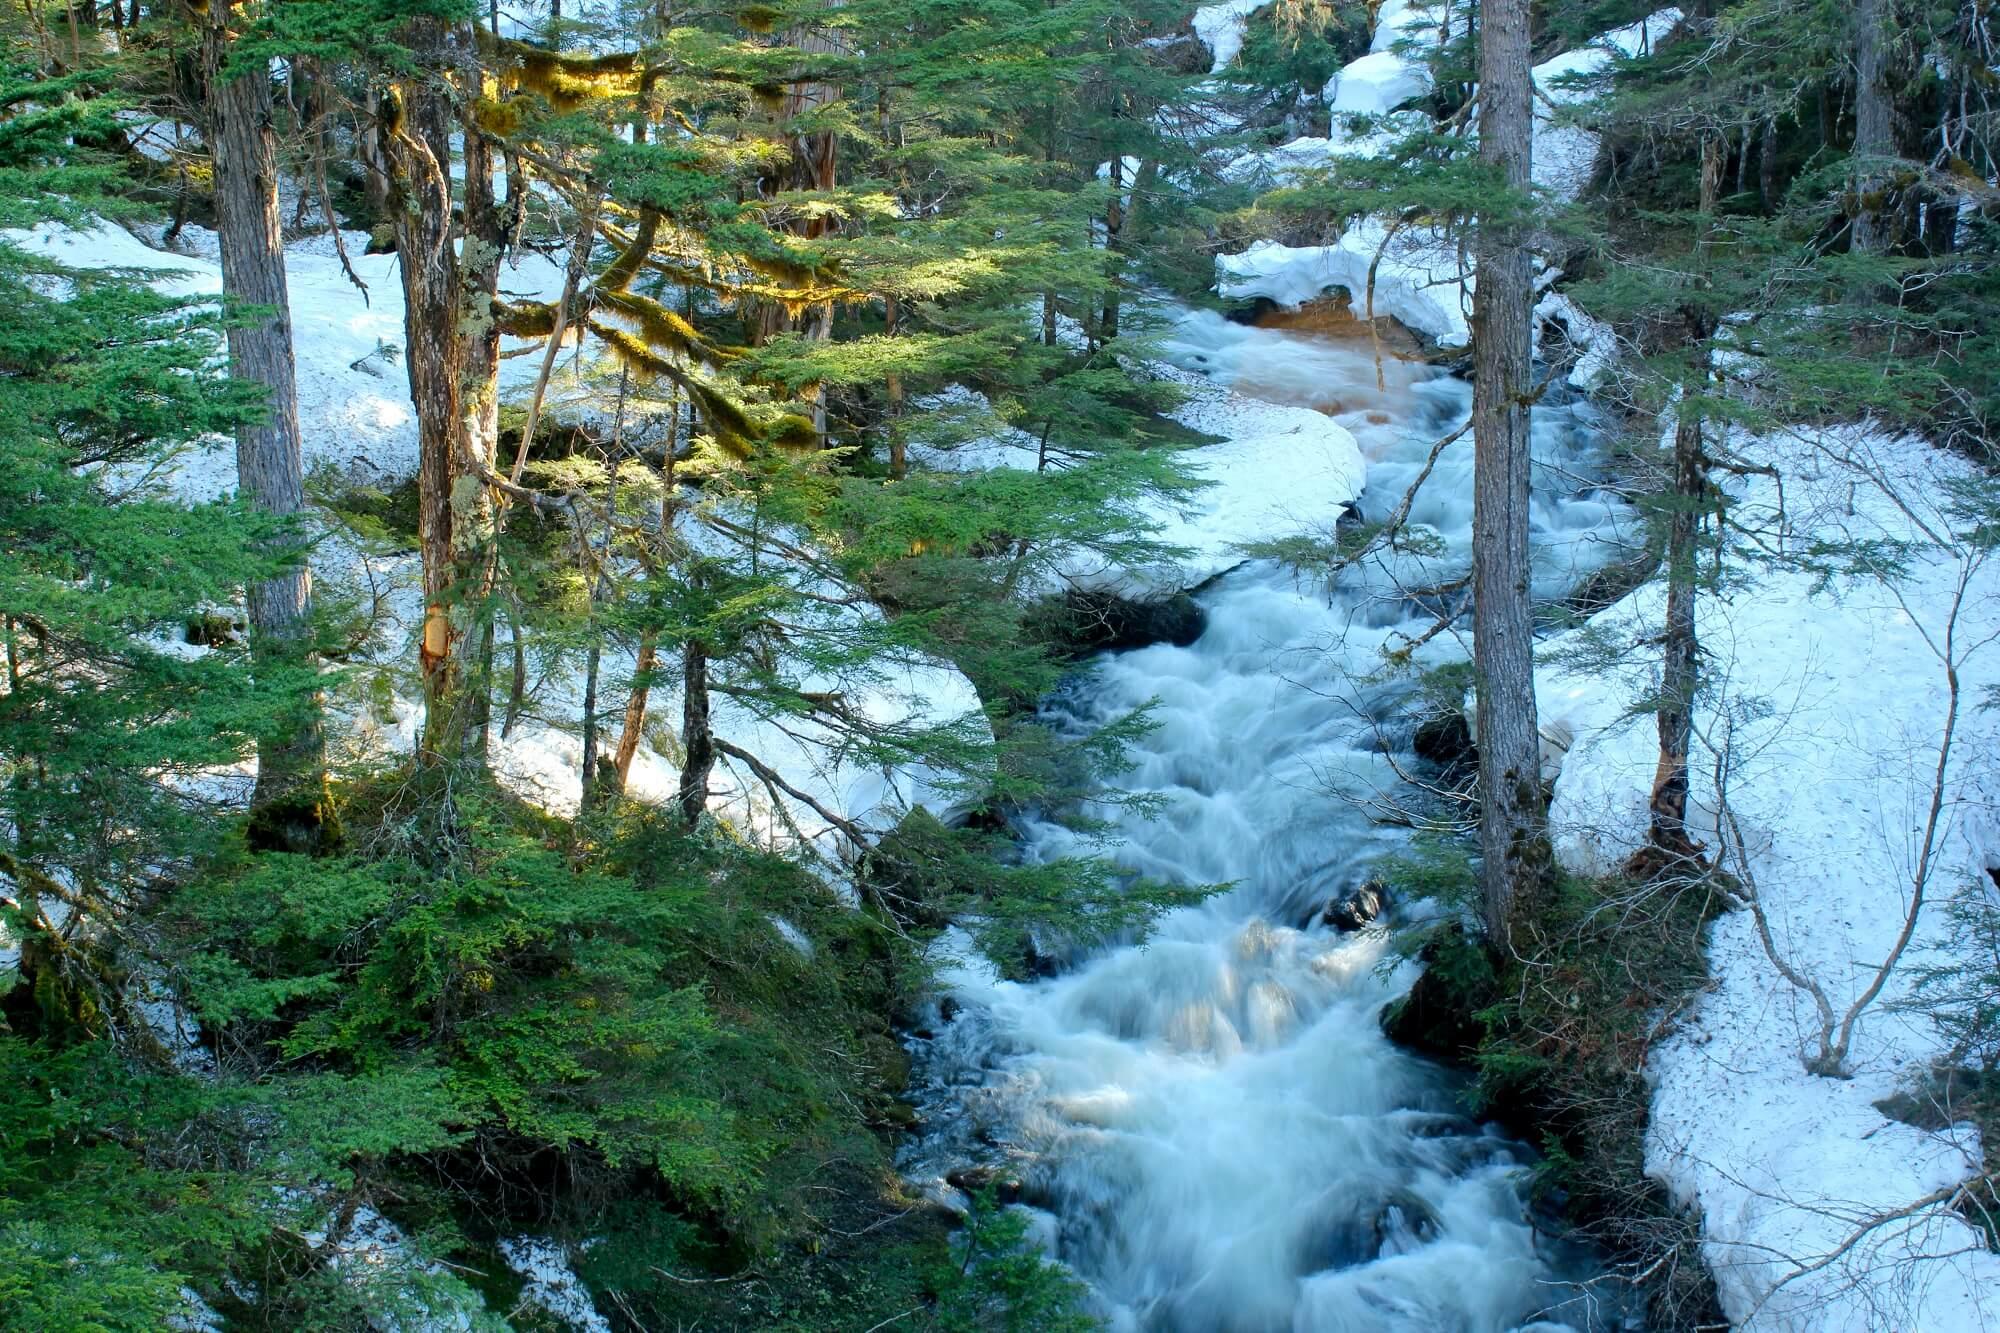 https://www.kawanti.com/wp-content/uploads/2018/10/Juneau-zip-Fish-Creek.jpg